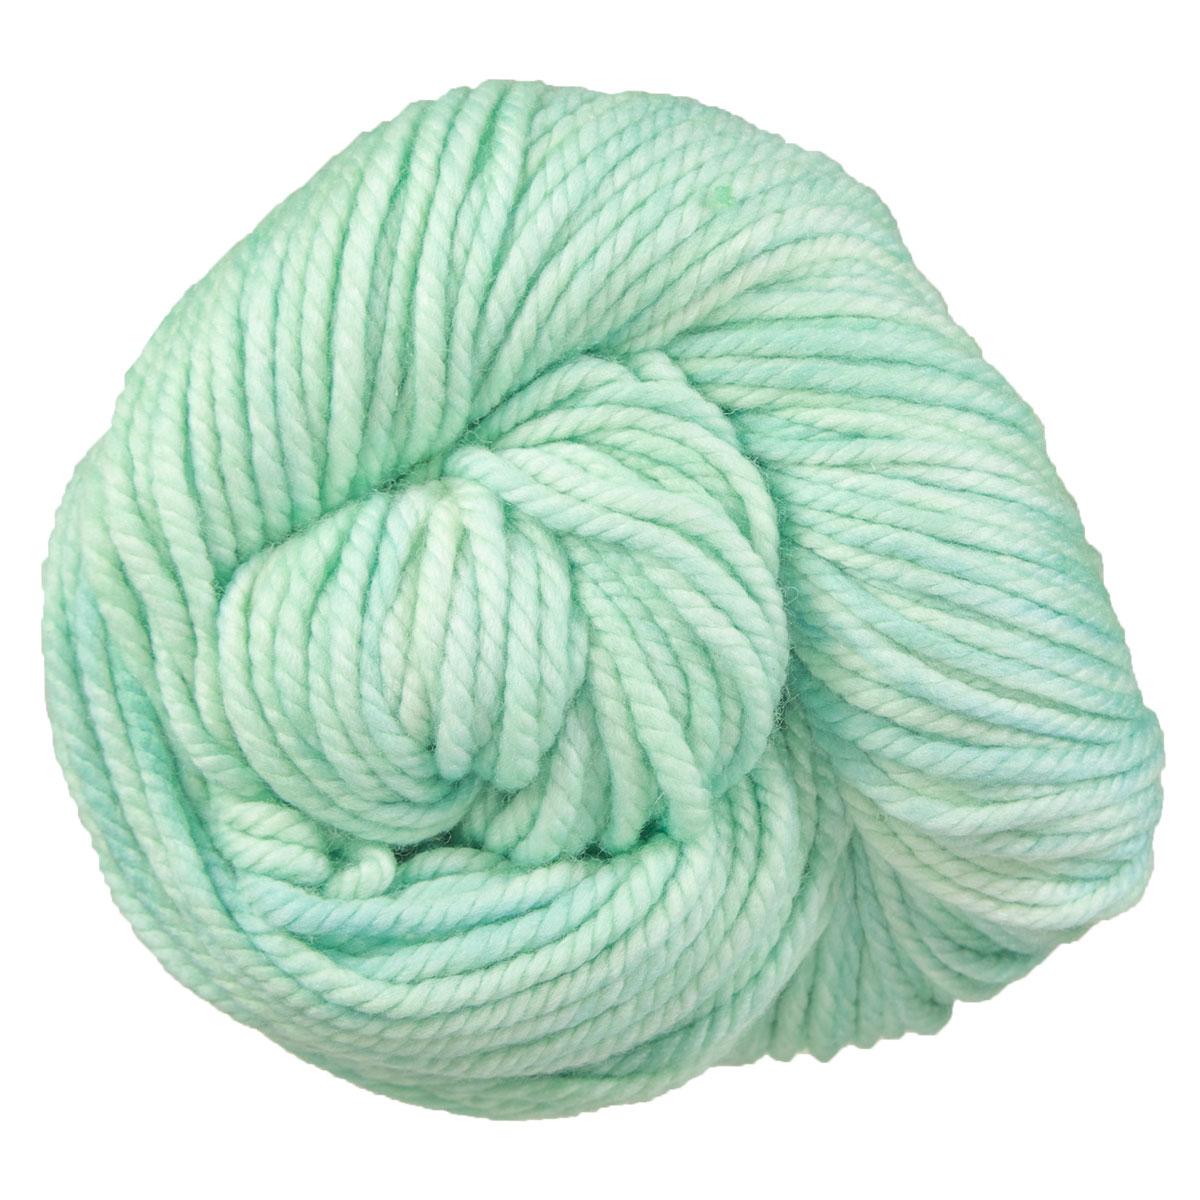 green yarn Forest superwash merino yarn Merino yarn 100/% Merino bulky merino Bulky Yarn green chunky yarn bulky weight yarn